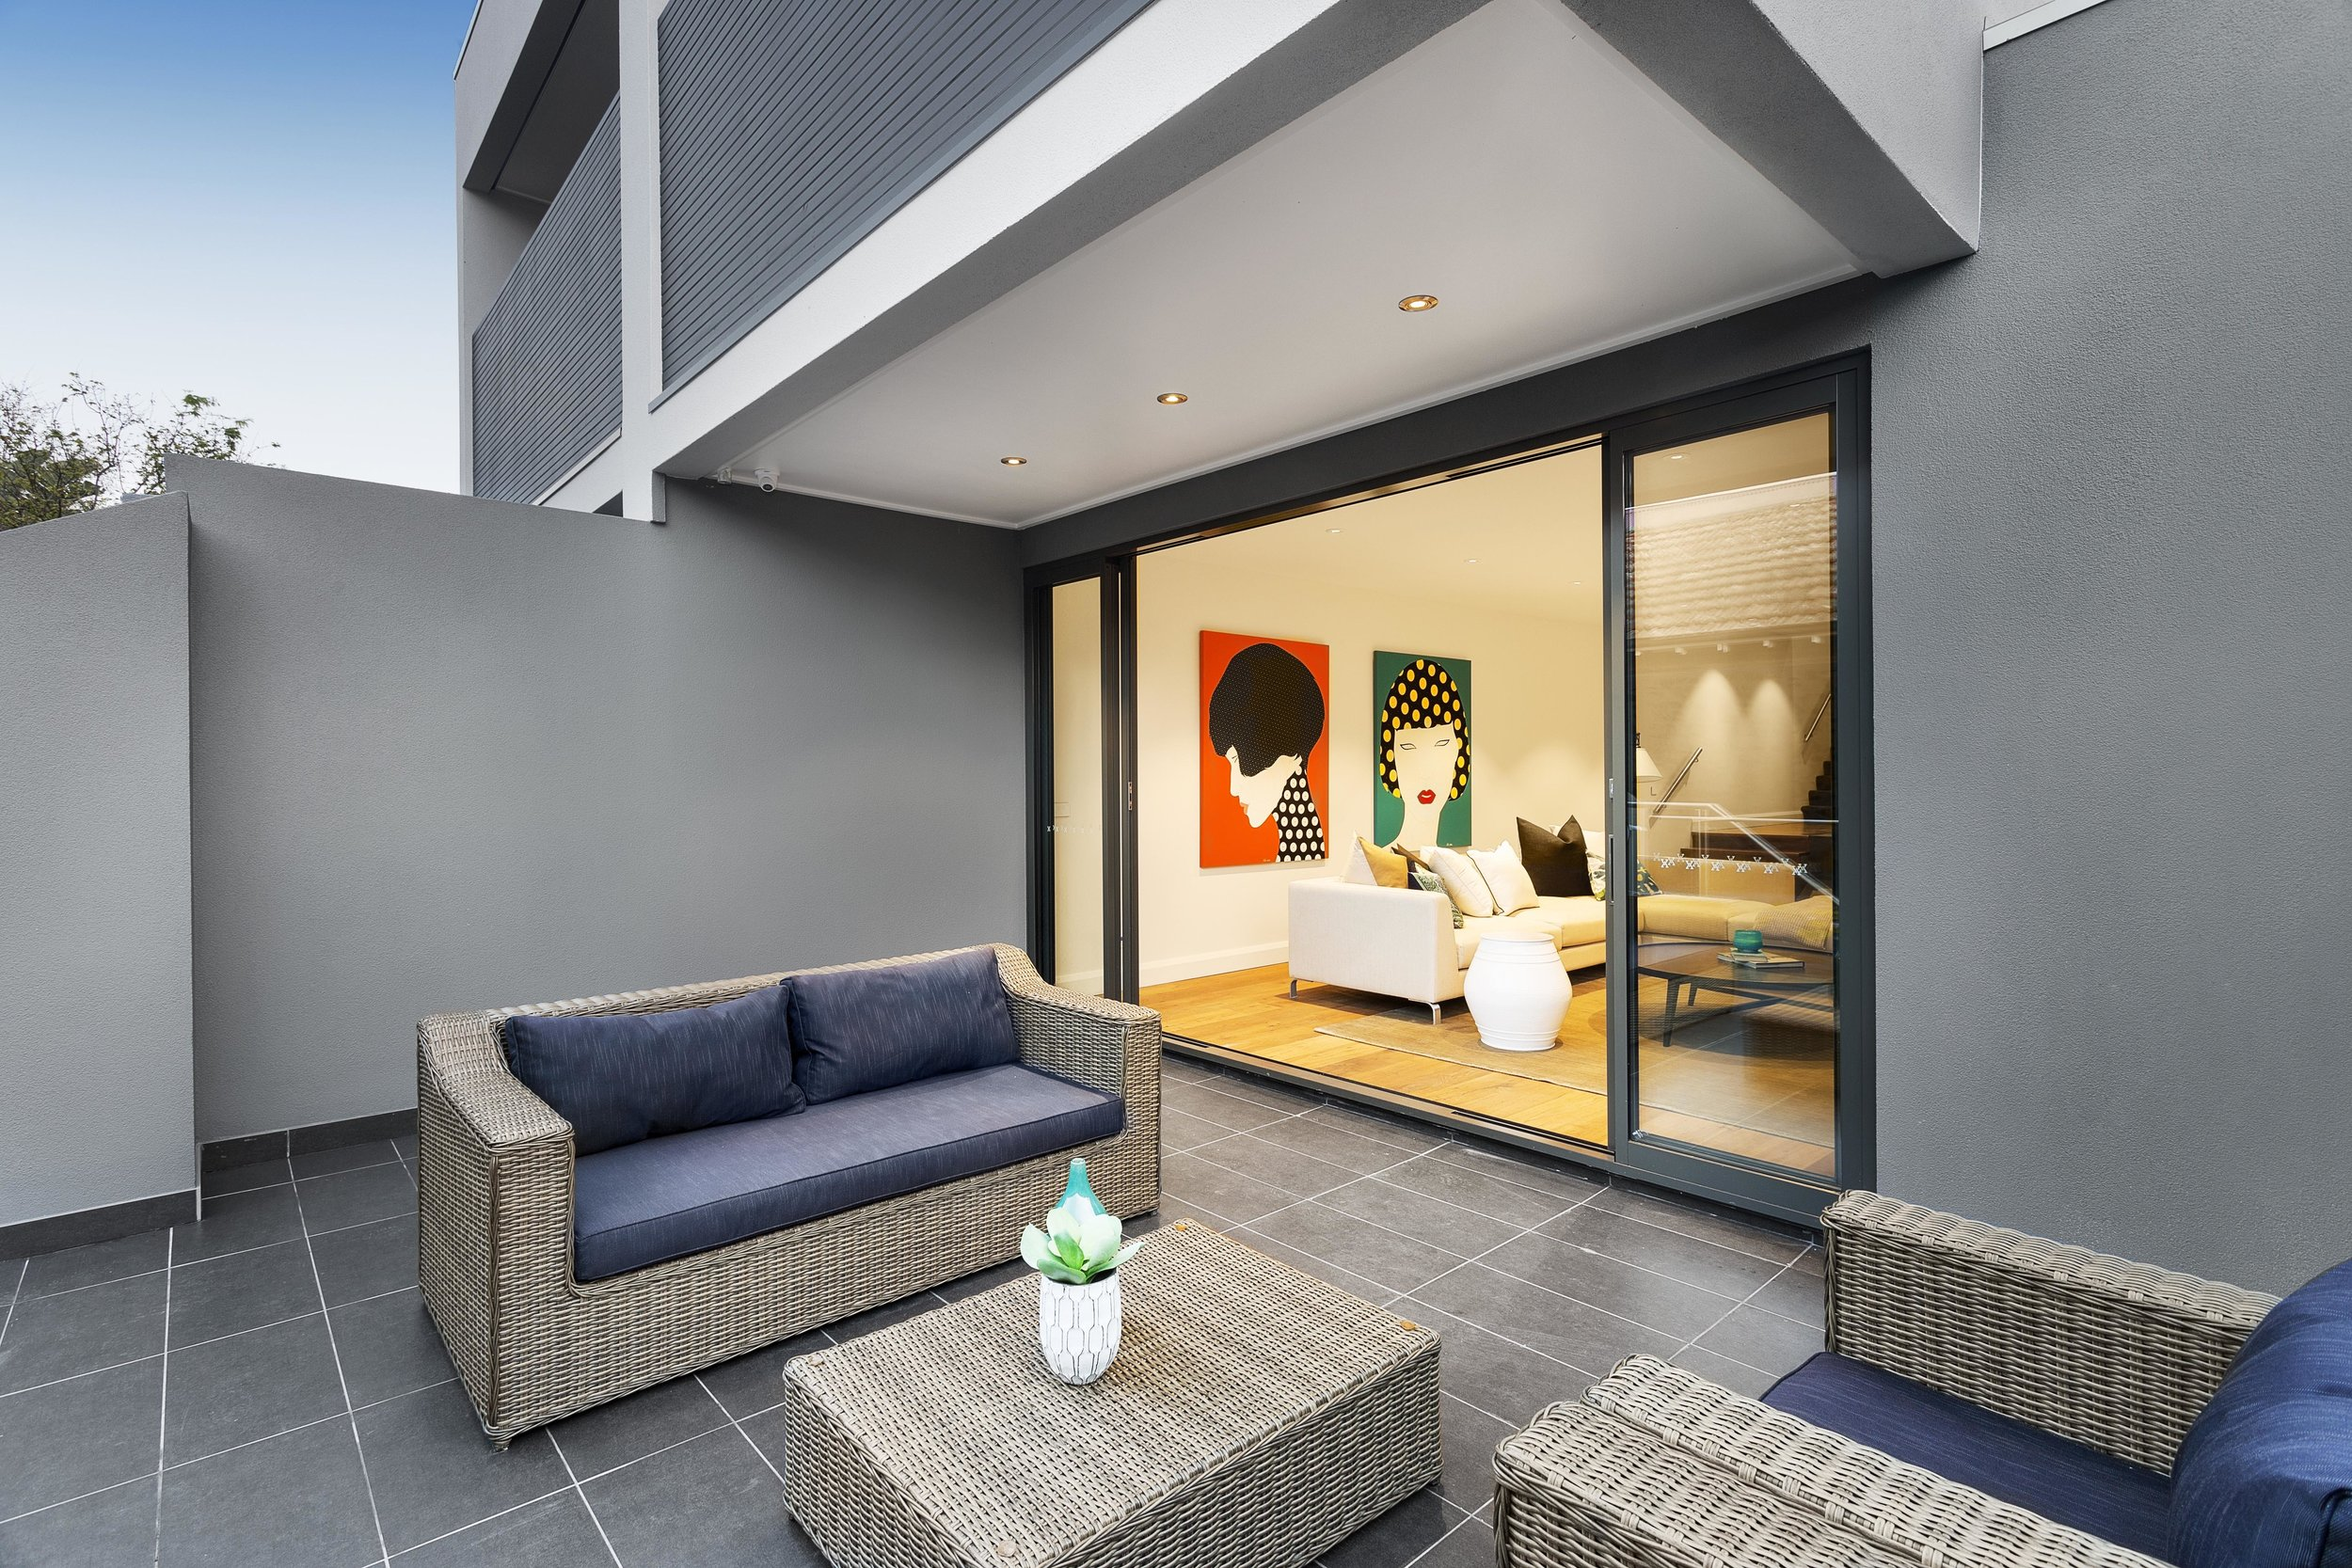 Armadale-Residence-Guymer-Bailey-Architects-10.jpg